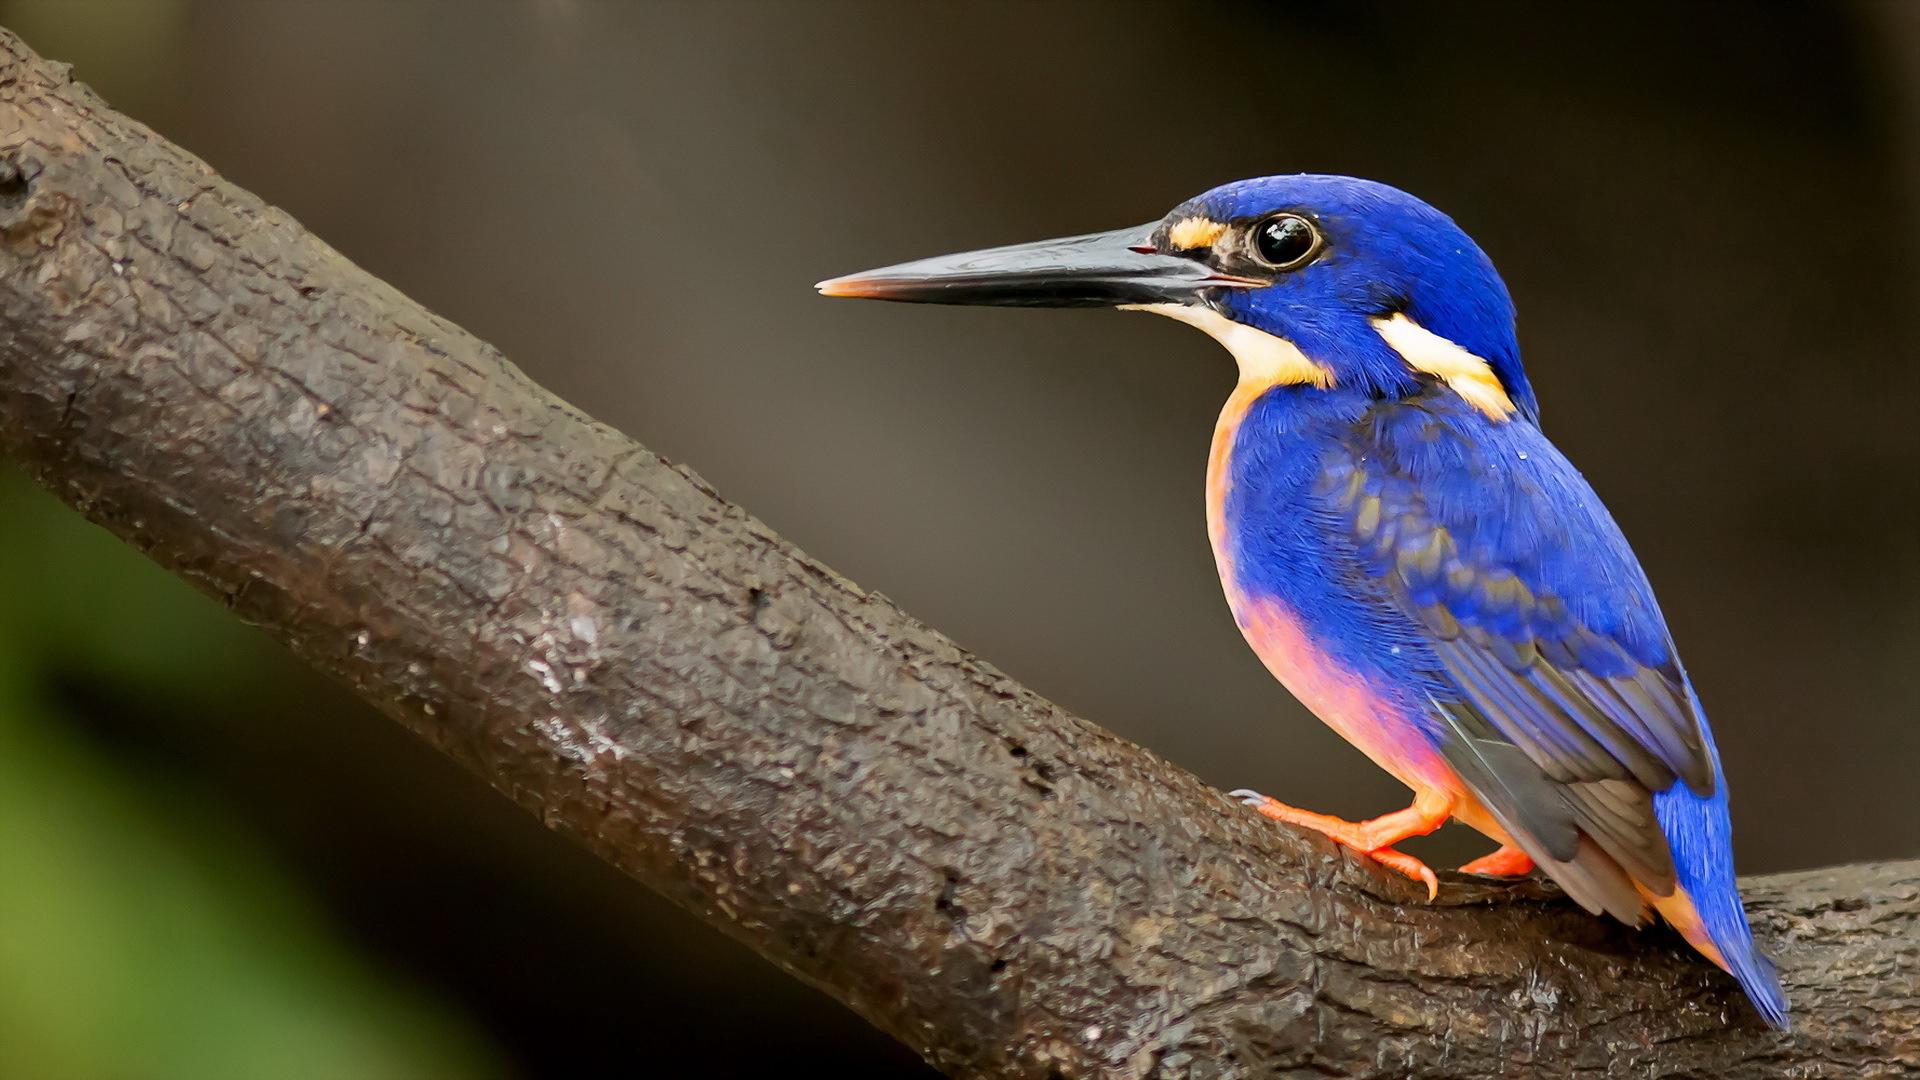 Fantastic Blue Bird Wallpaper 39975 1920x1080 Px